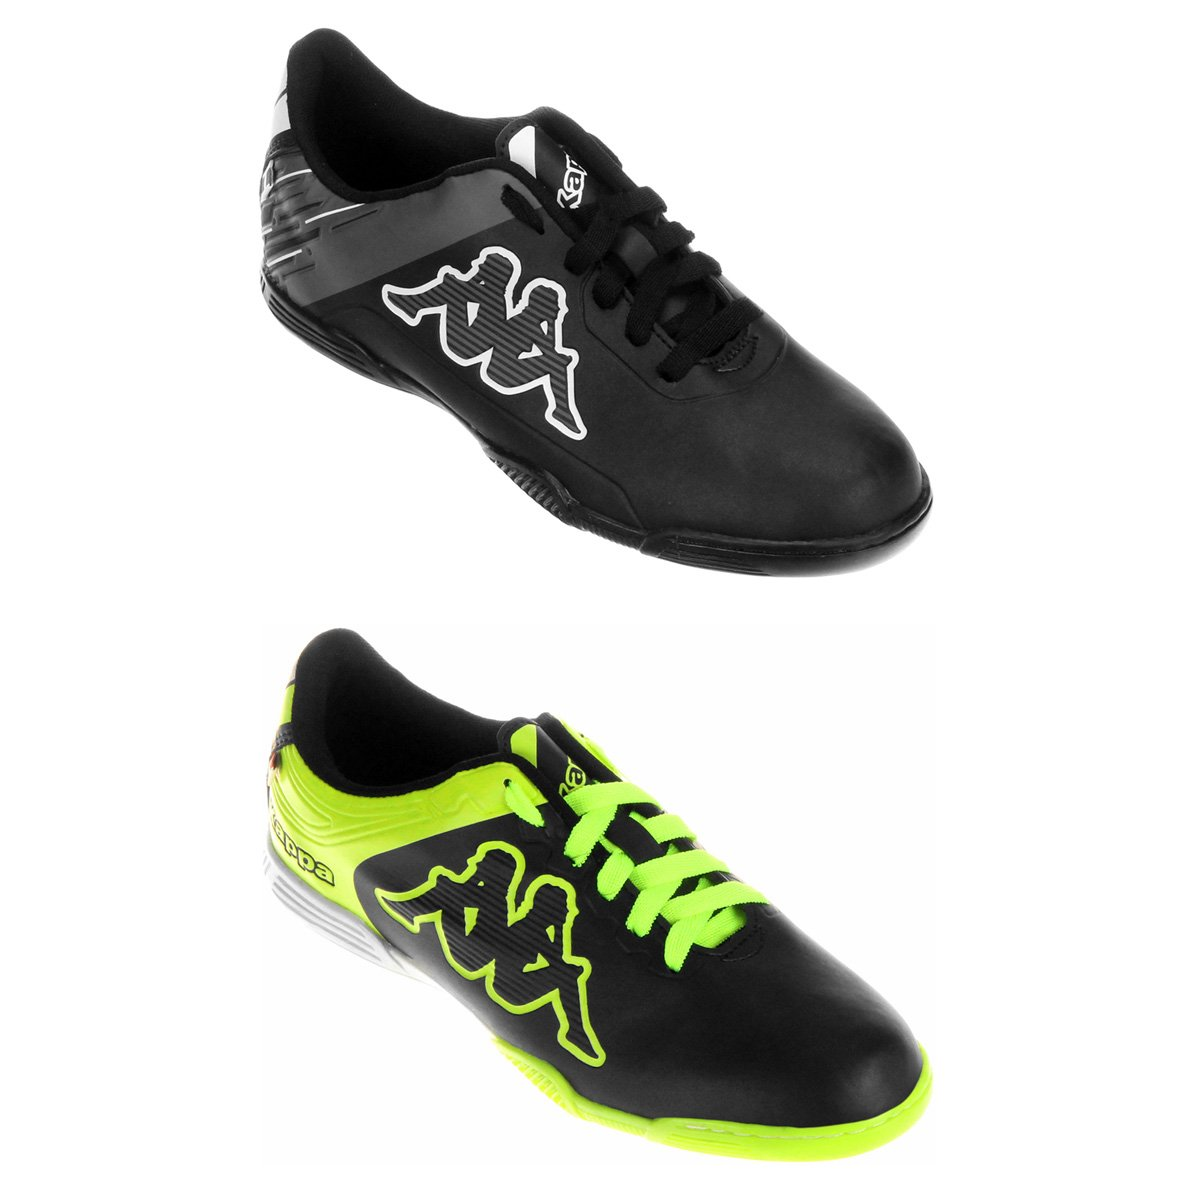 e70c504ea1 Kit Chuteira Kappa Viento Futsal + Chuteira Kappa Fuerza Futsal - Compre  Agora